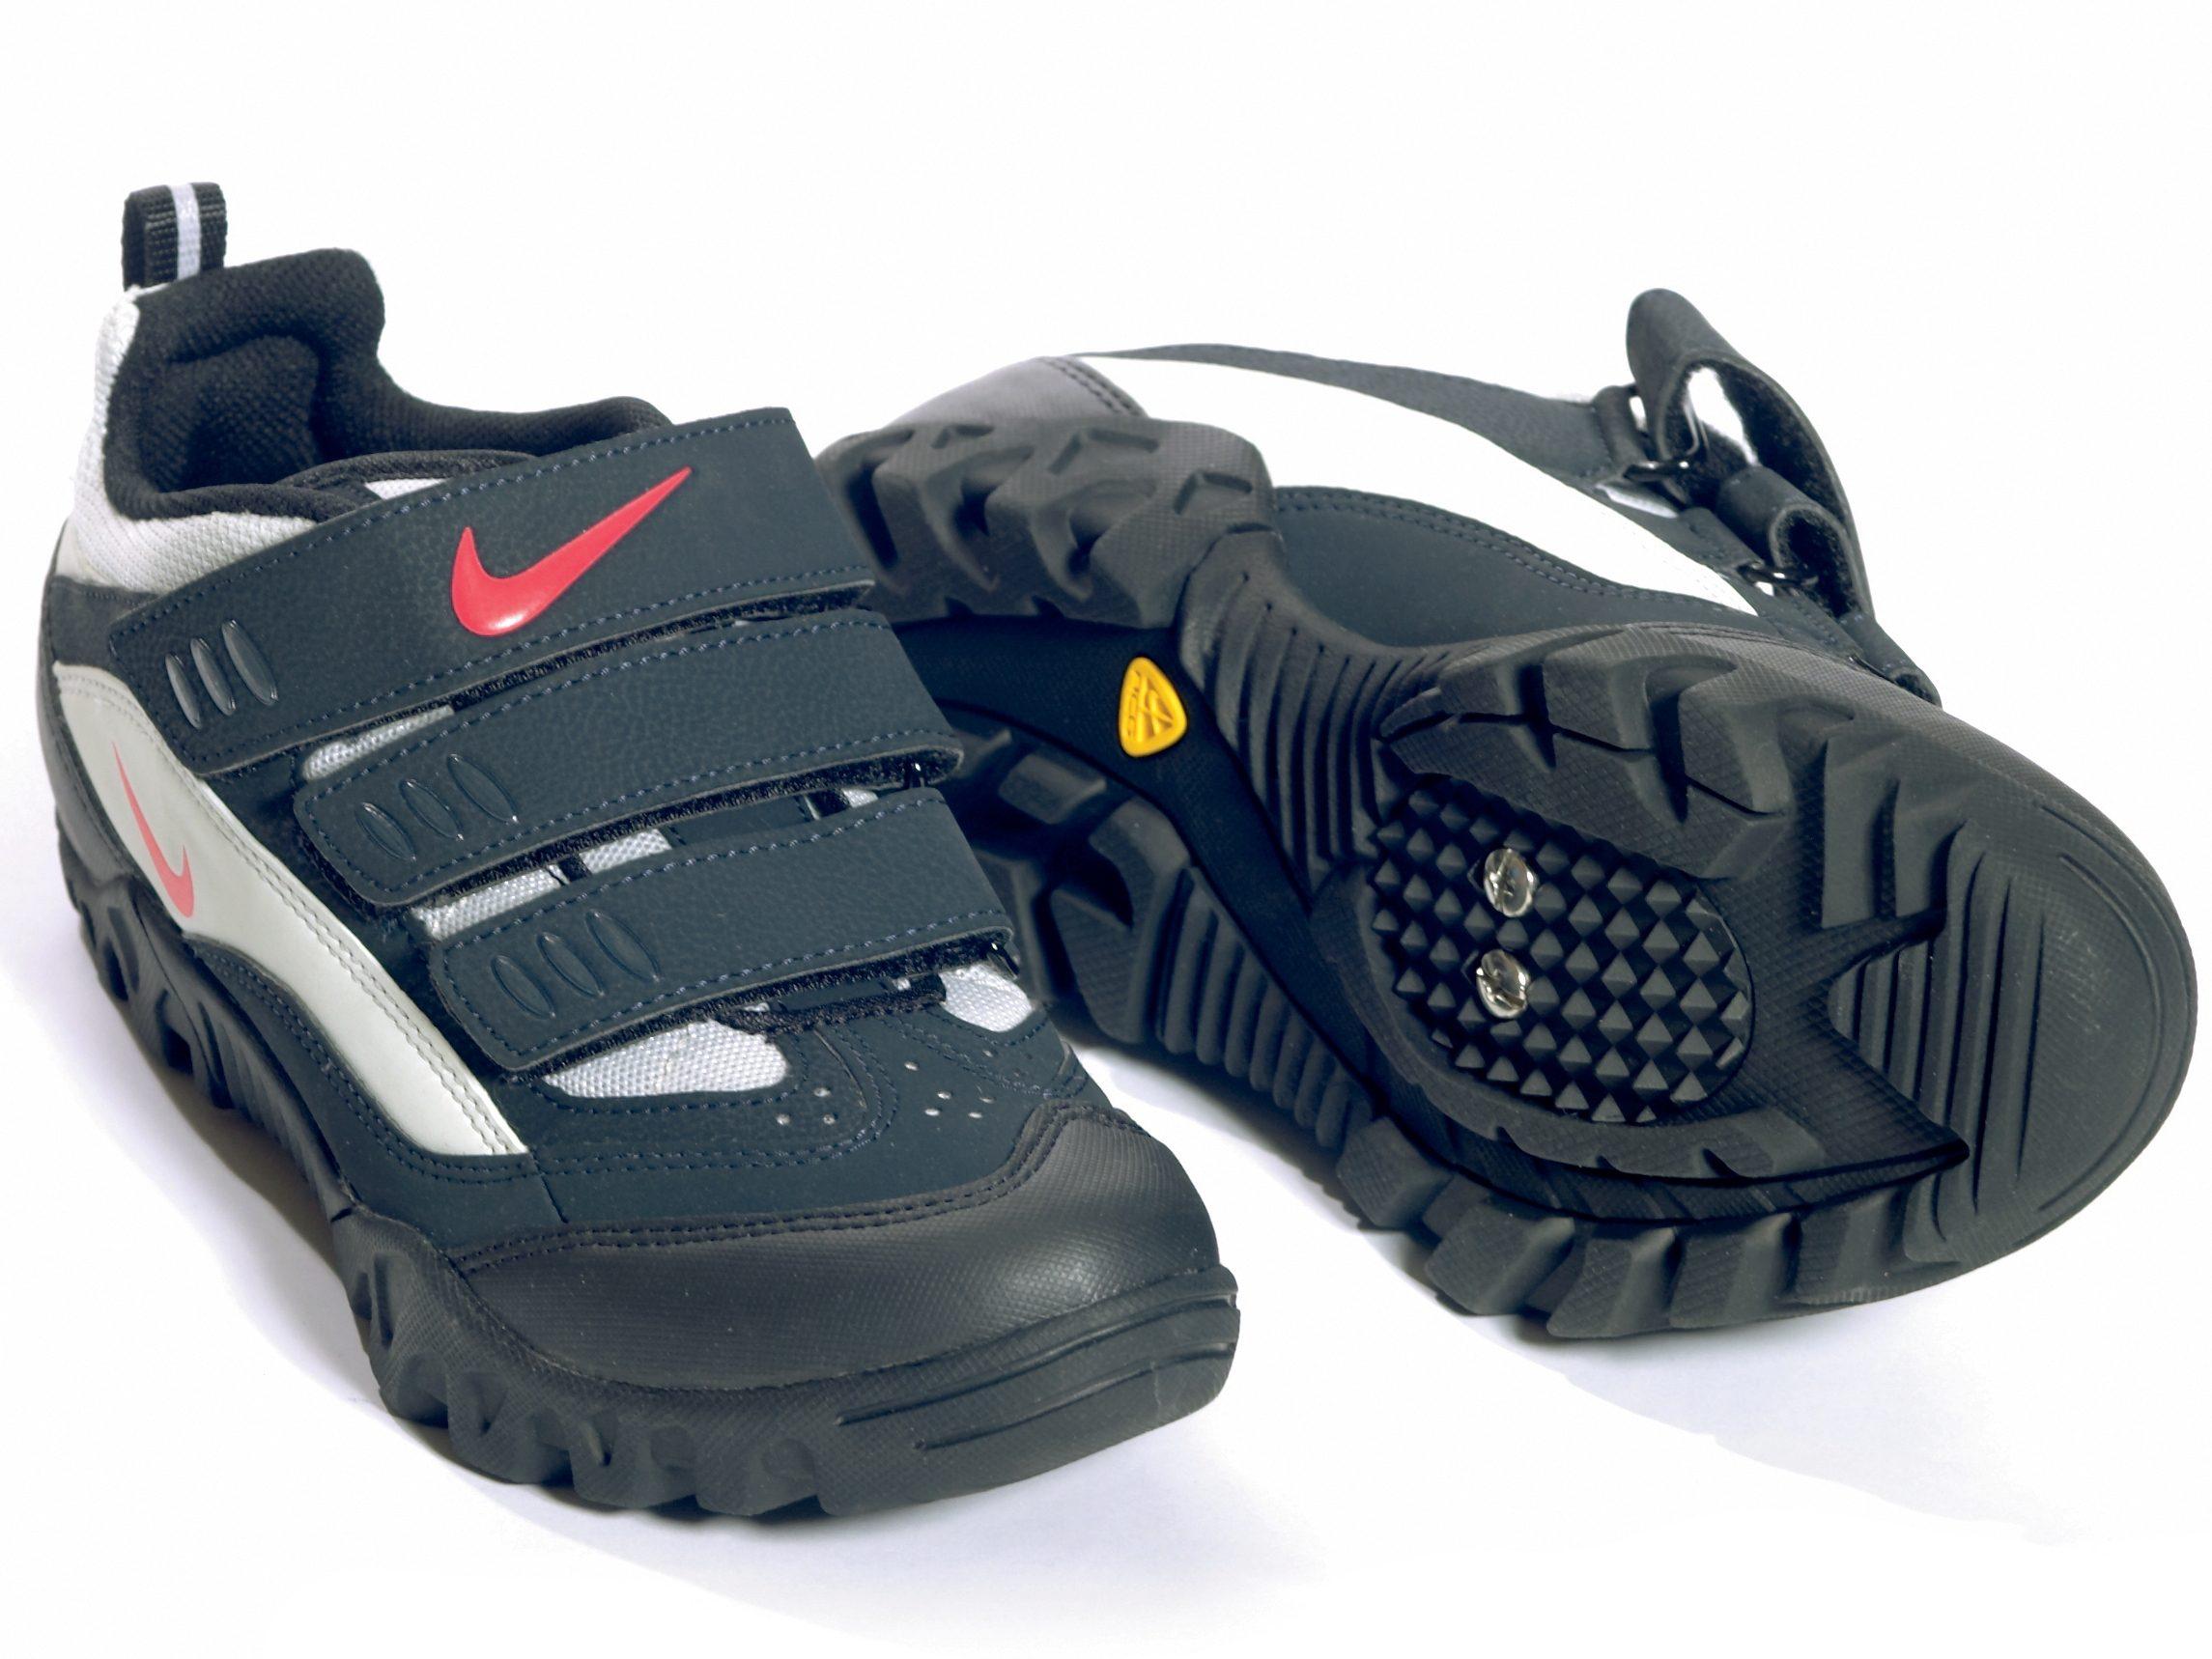 Nike Kato 3 strap - BikeRadar